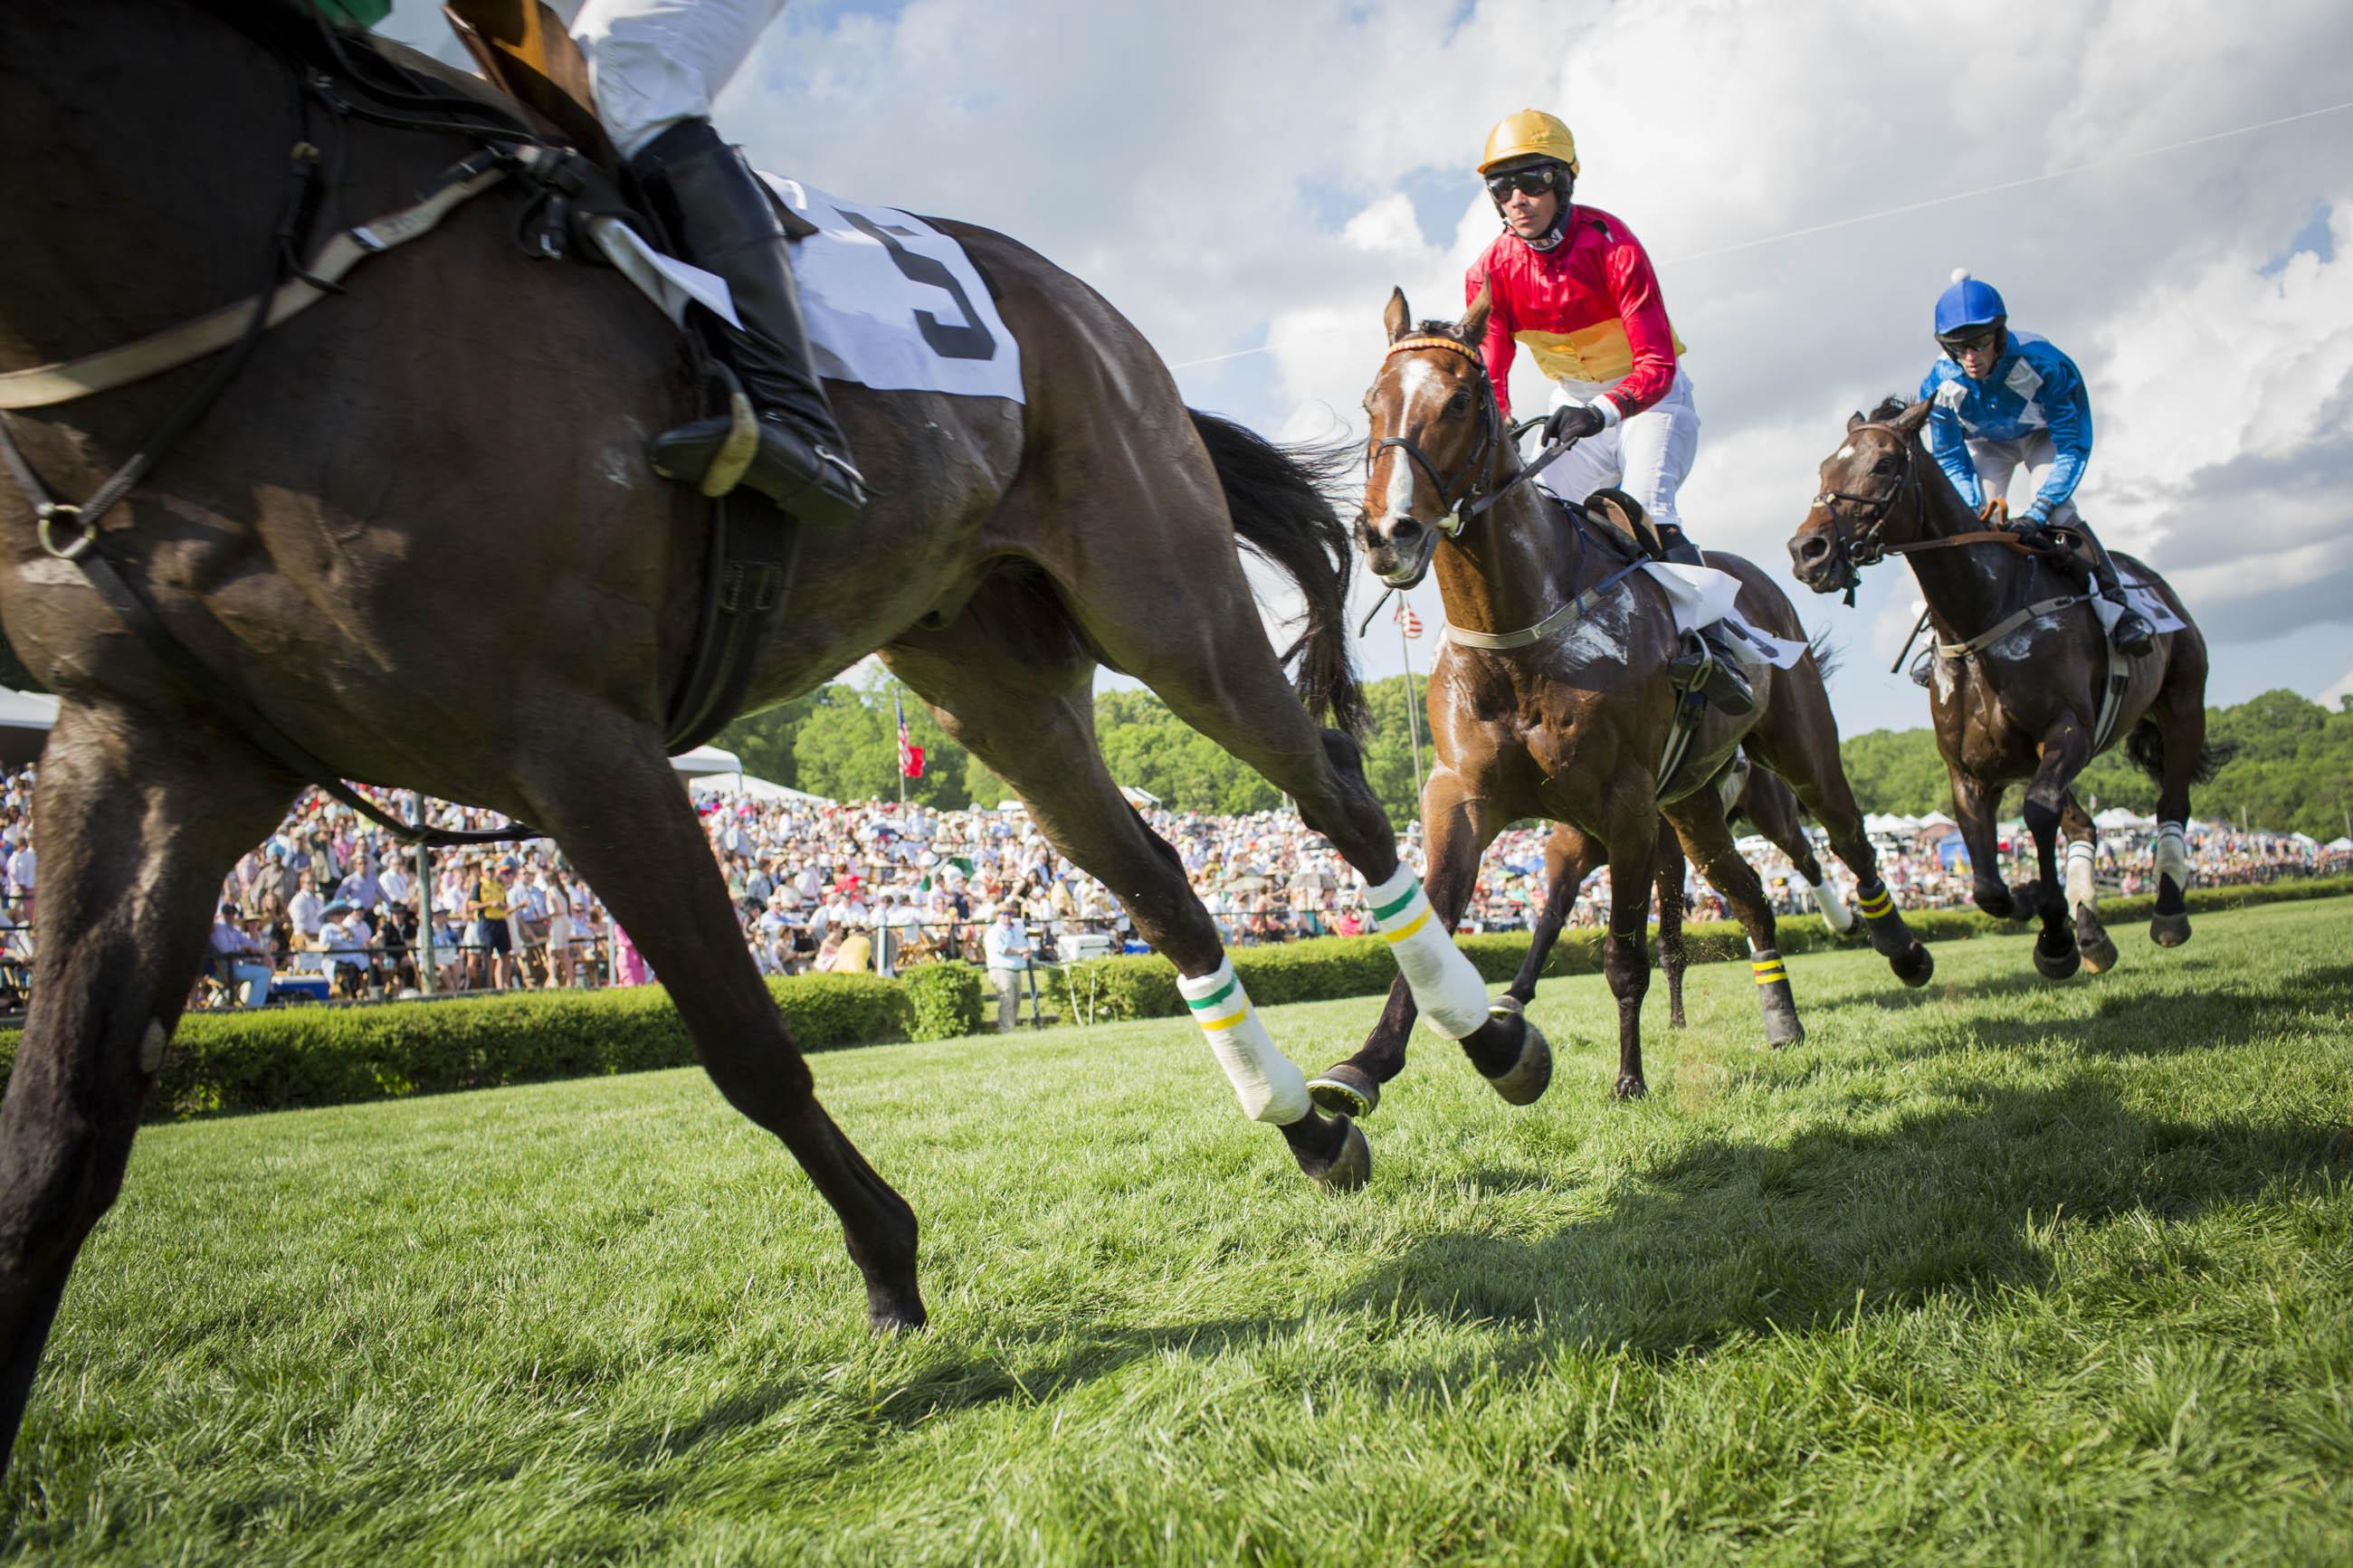 Close up horses racing